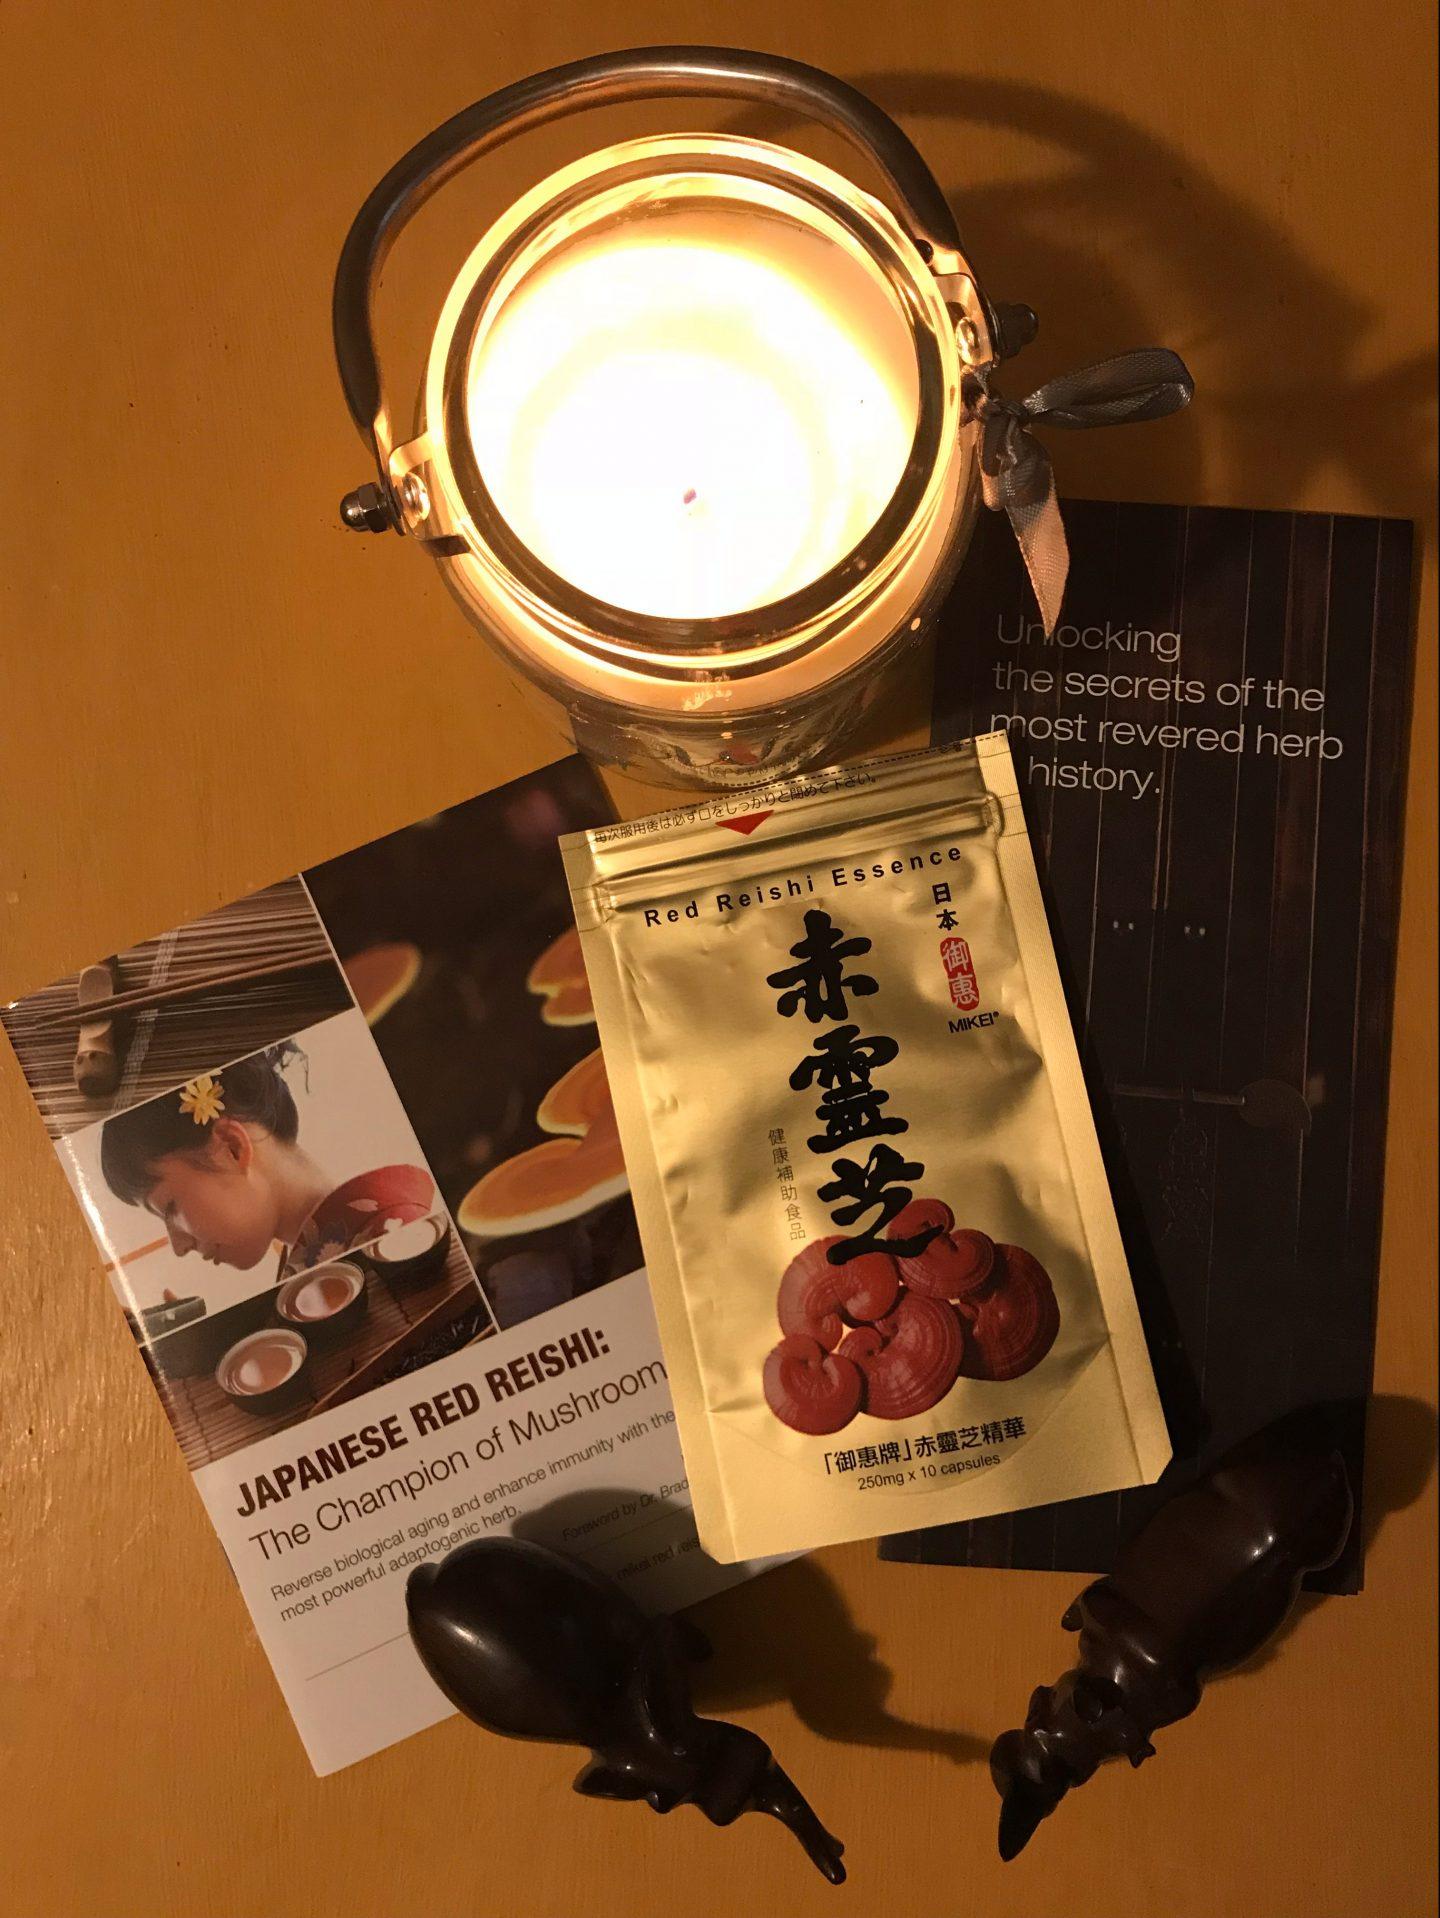 Japanese Red Reishi – The champion of mushrooms